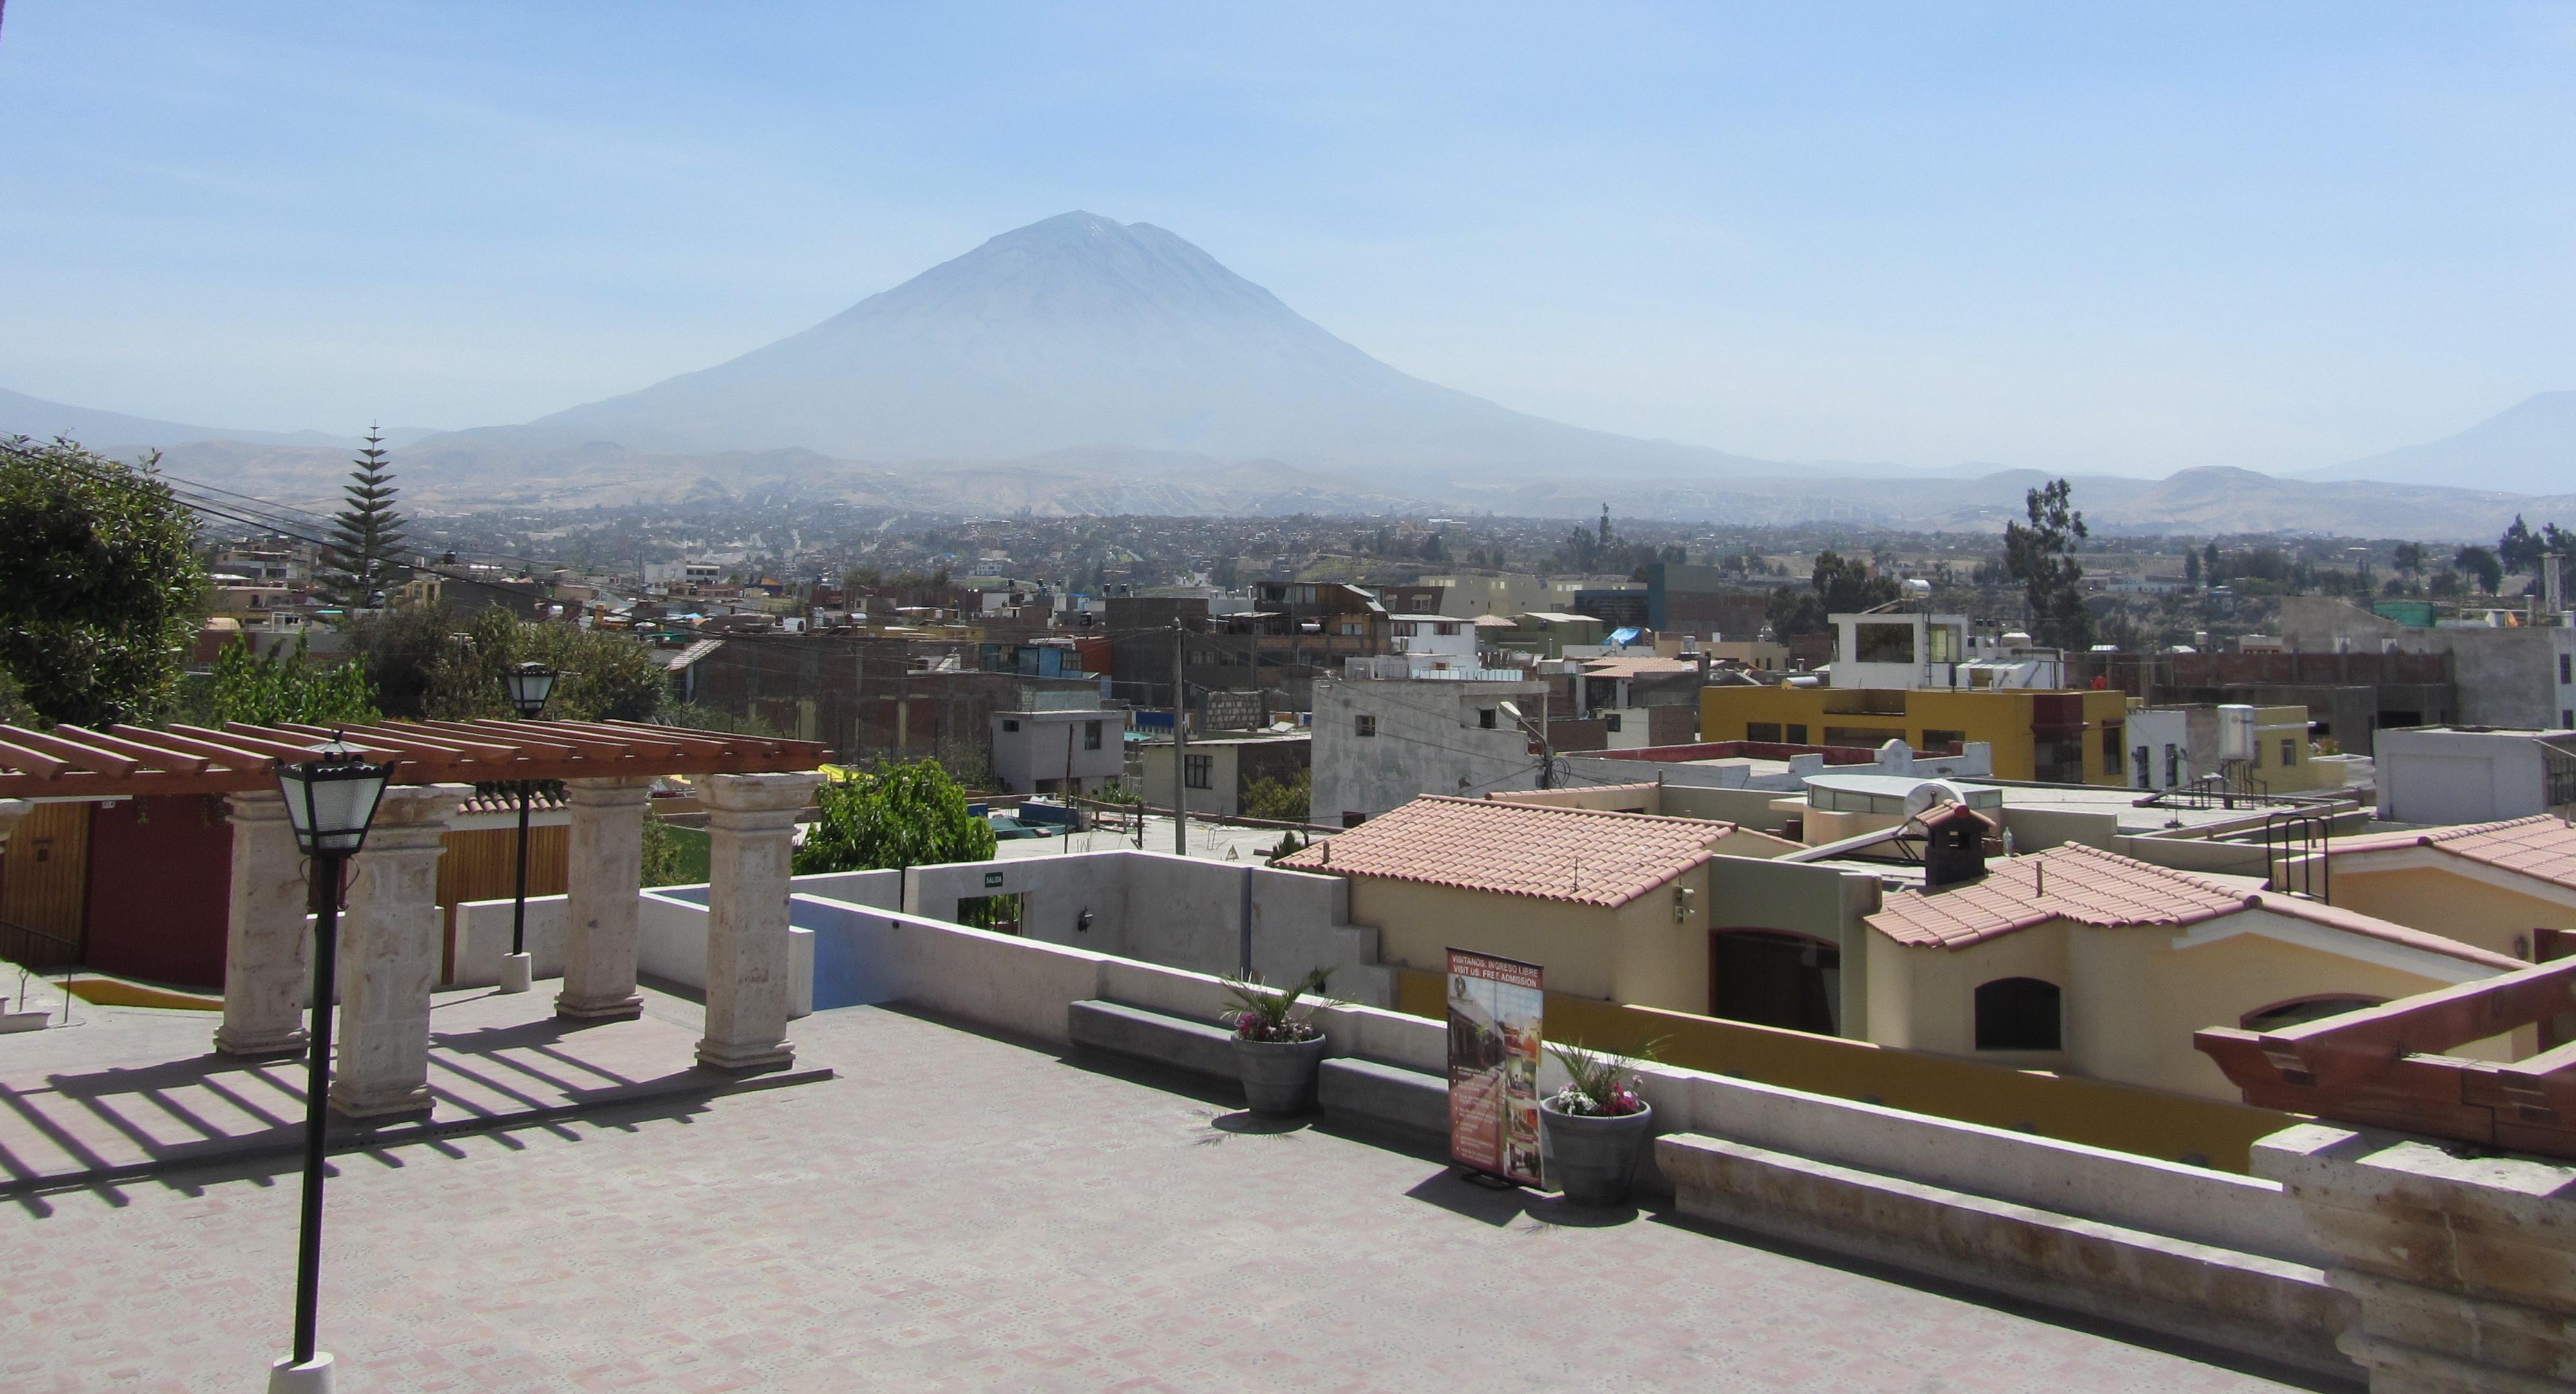 Volcan Misti 5822 m.